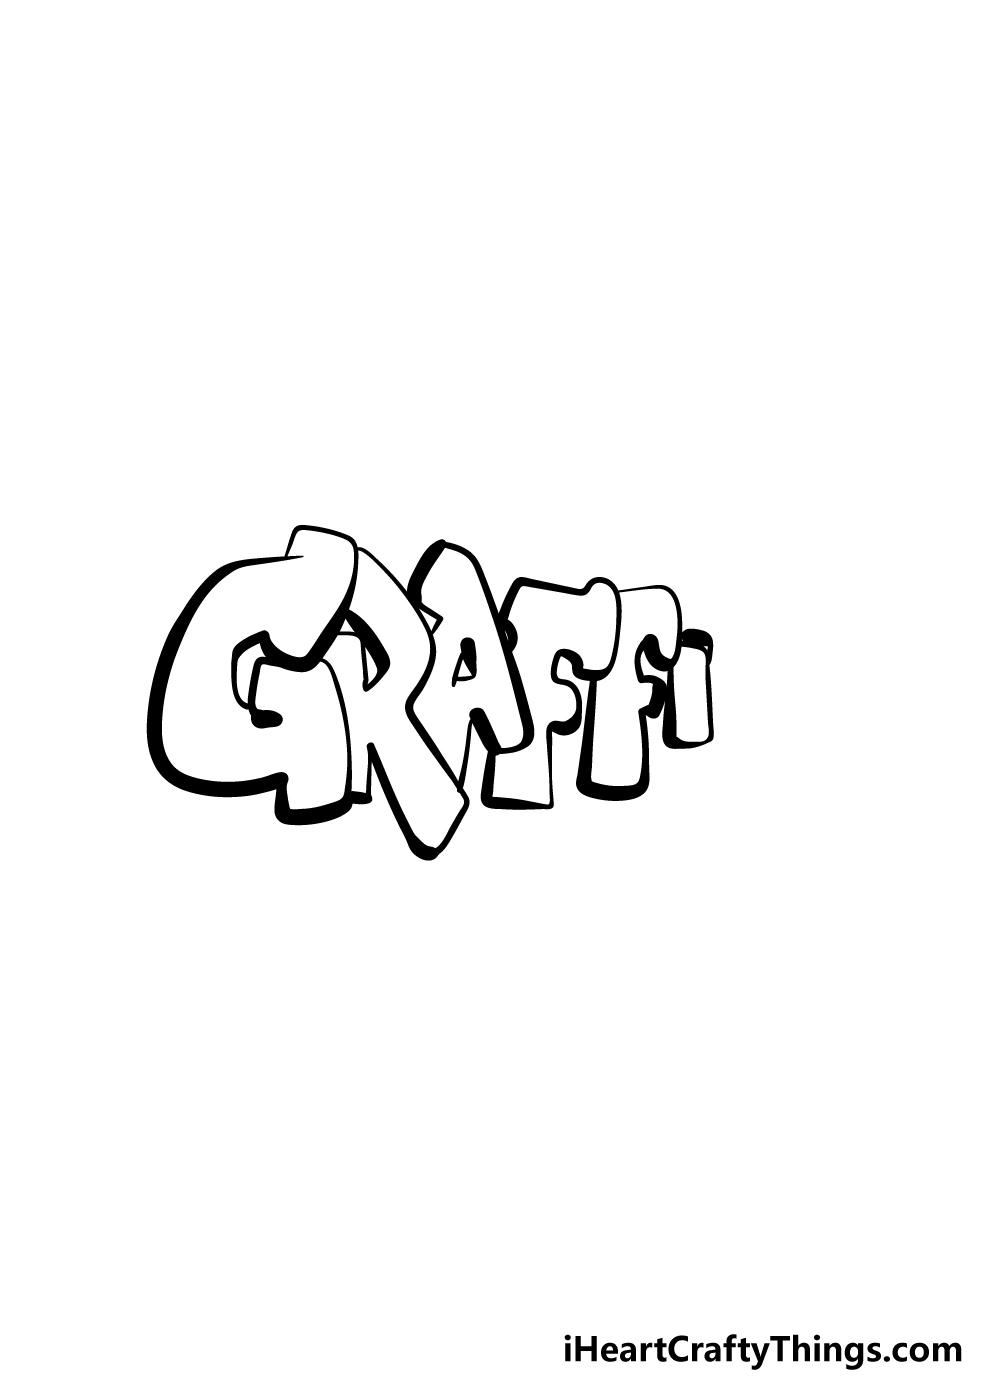 graffiti drawing step 5